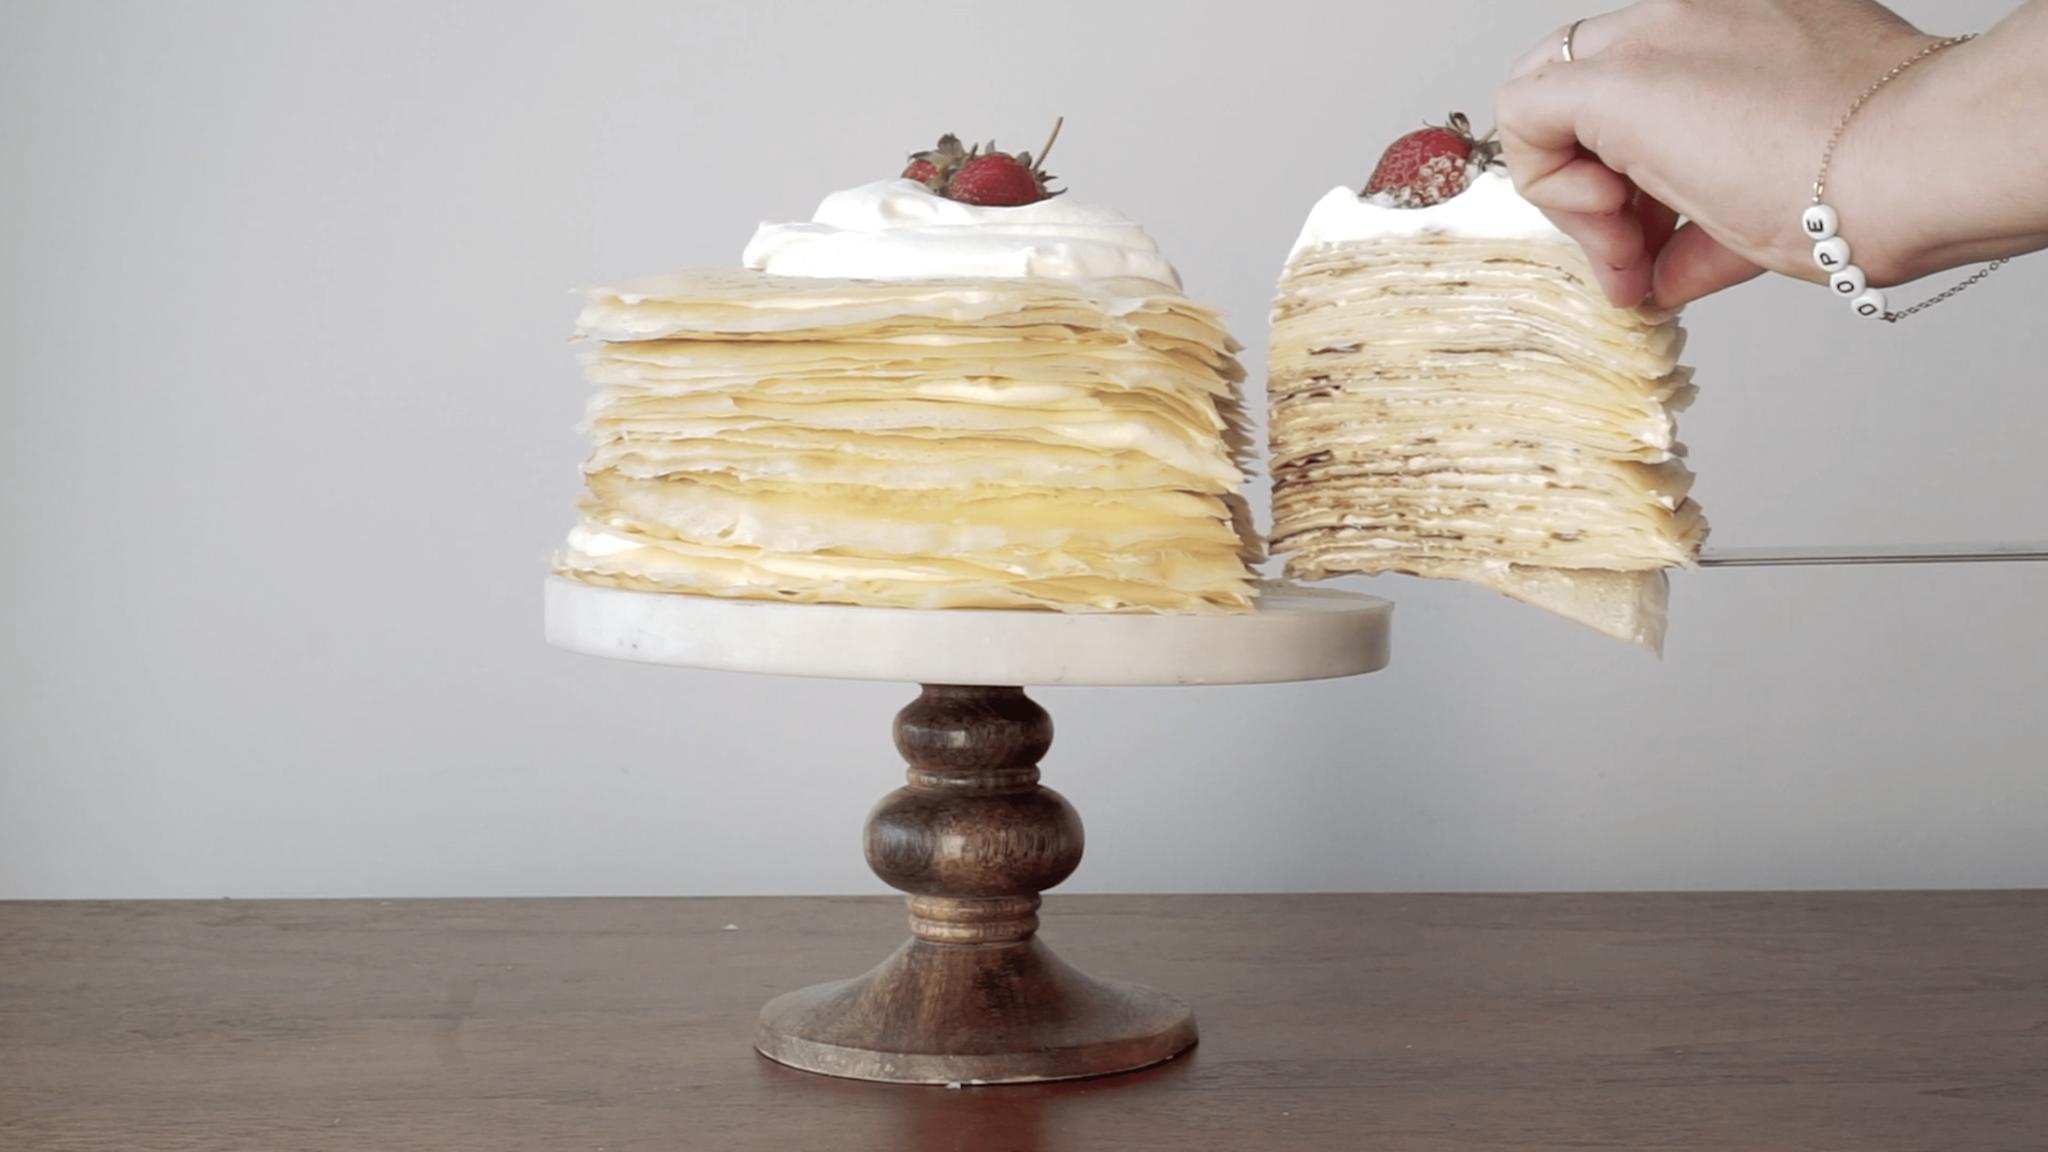 Amanda Frederickson's Crepe Cake Recipe